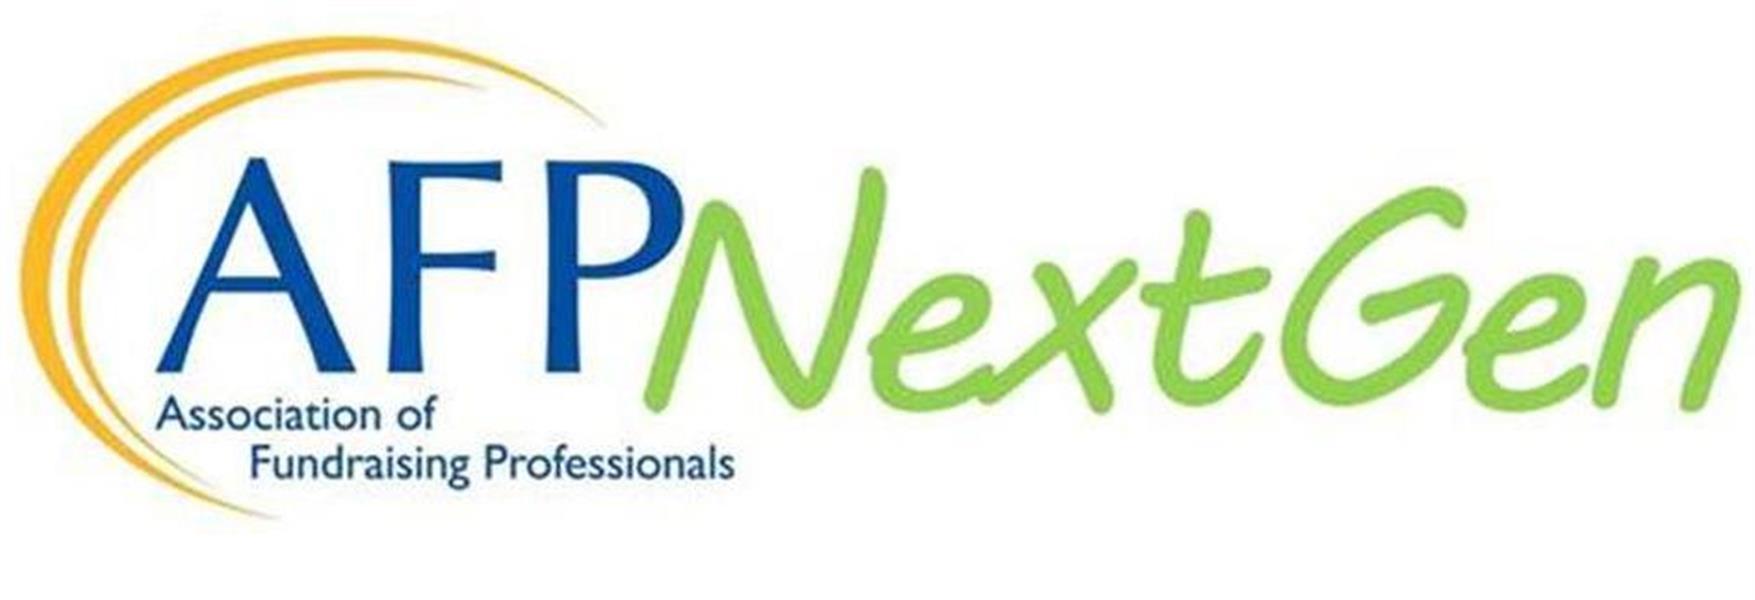 c0b4ba03-606f-4e6c-96c8-bcf014712a31_AFP NextGen Logo.jpg